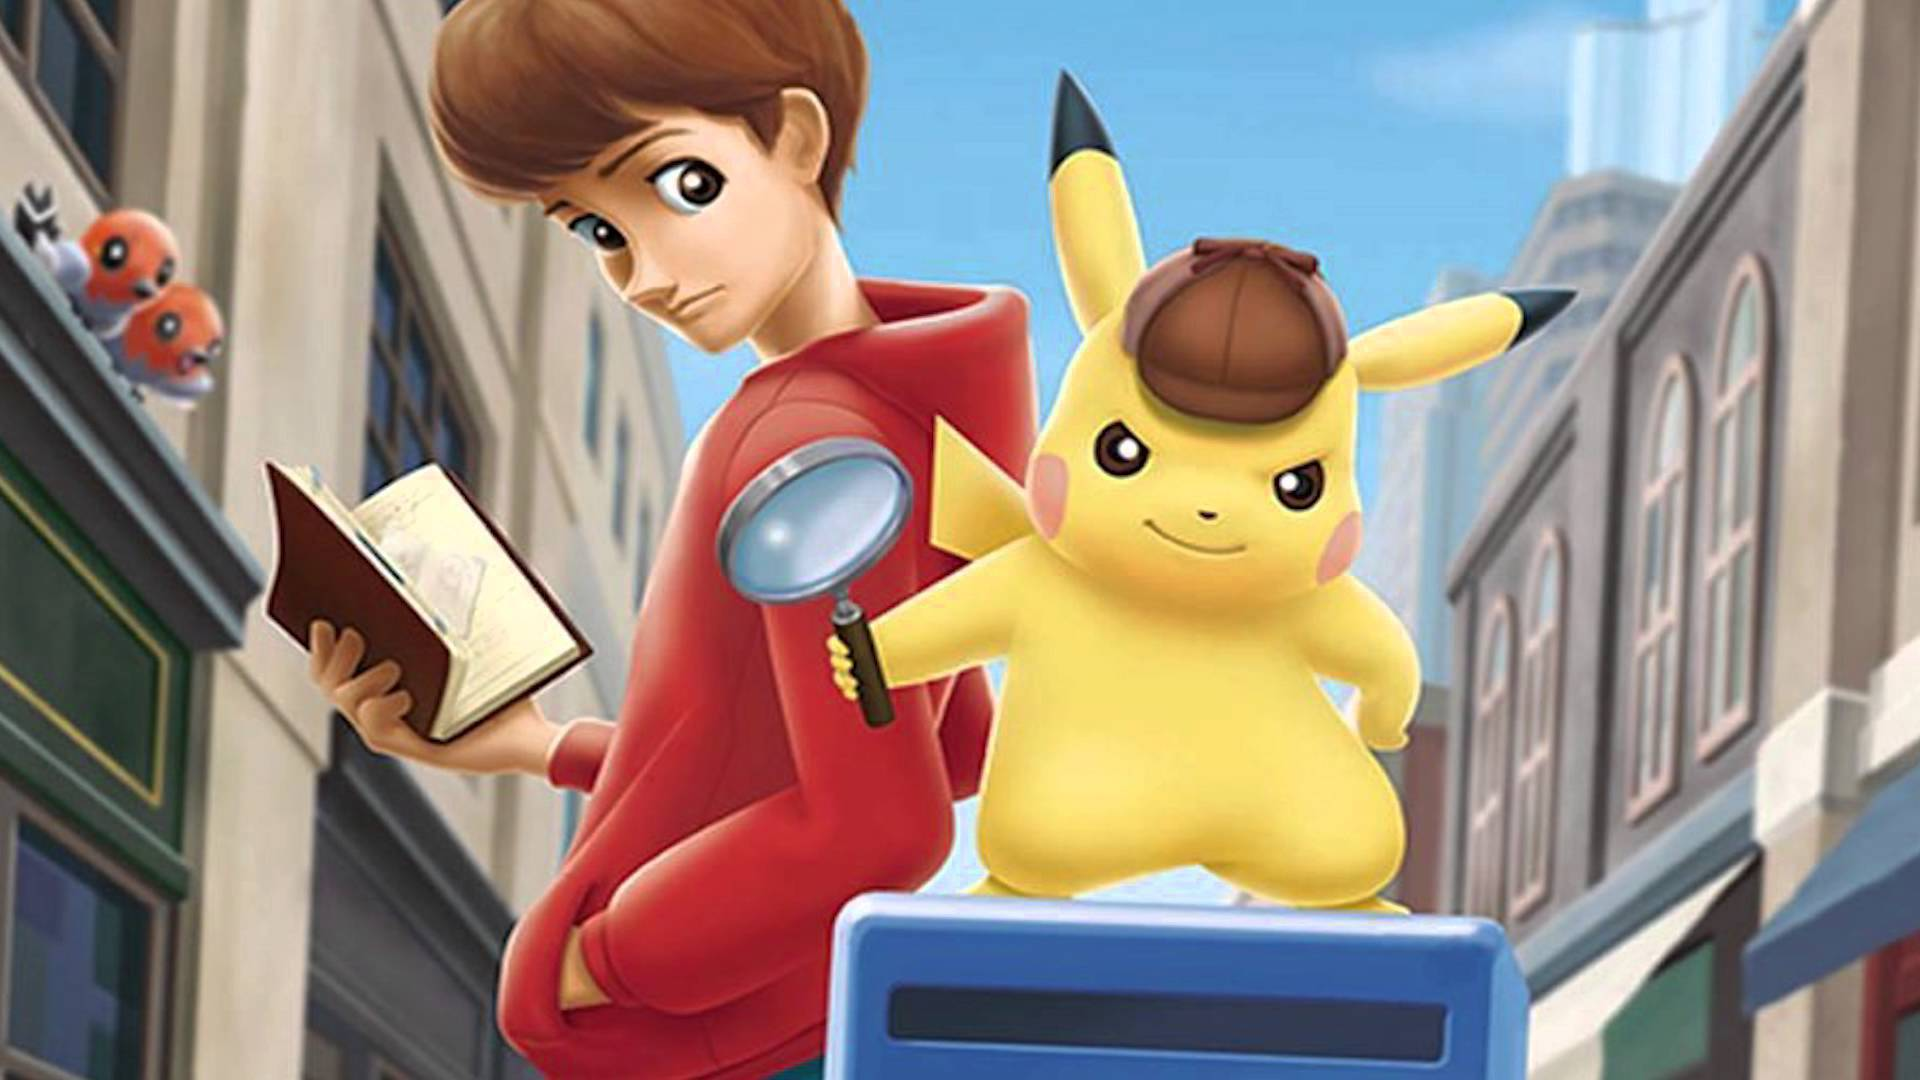 Ryan Reynolds será Pikachu en la película